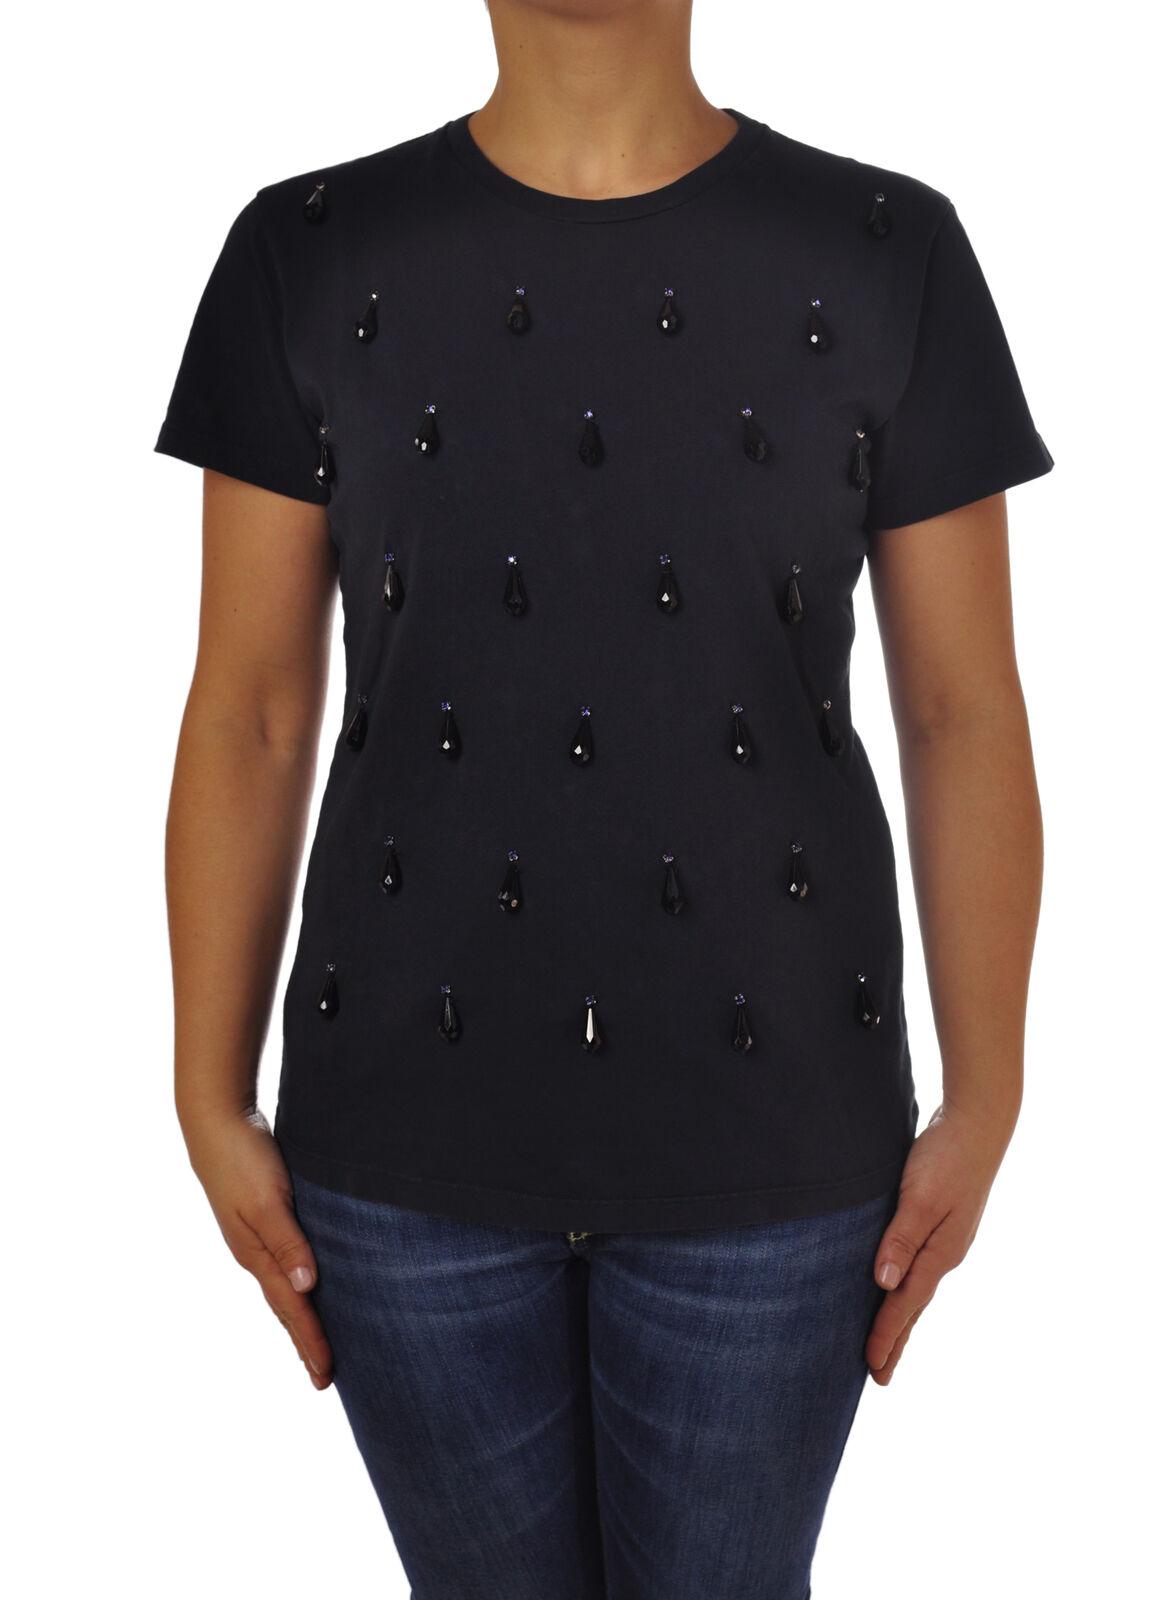 Rosao - Topwear-T-shirts - Woman - Blau - 4777826F184651